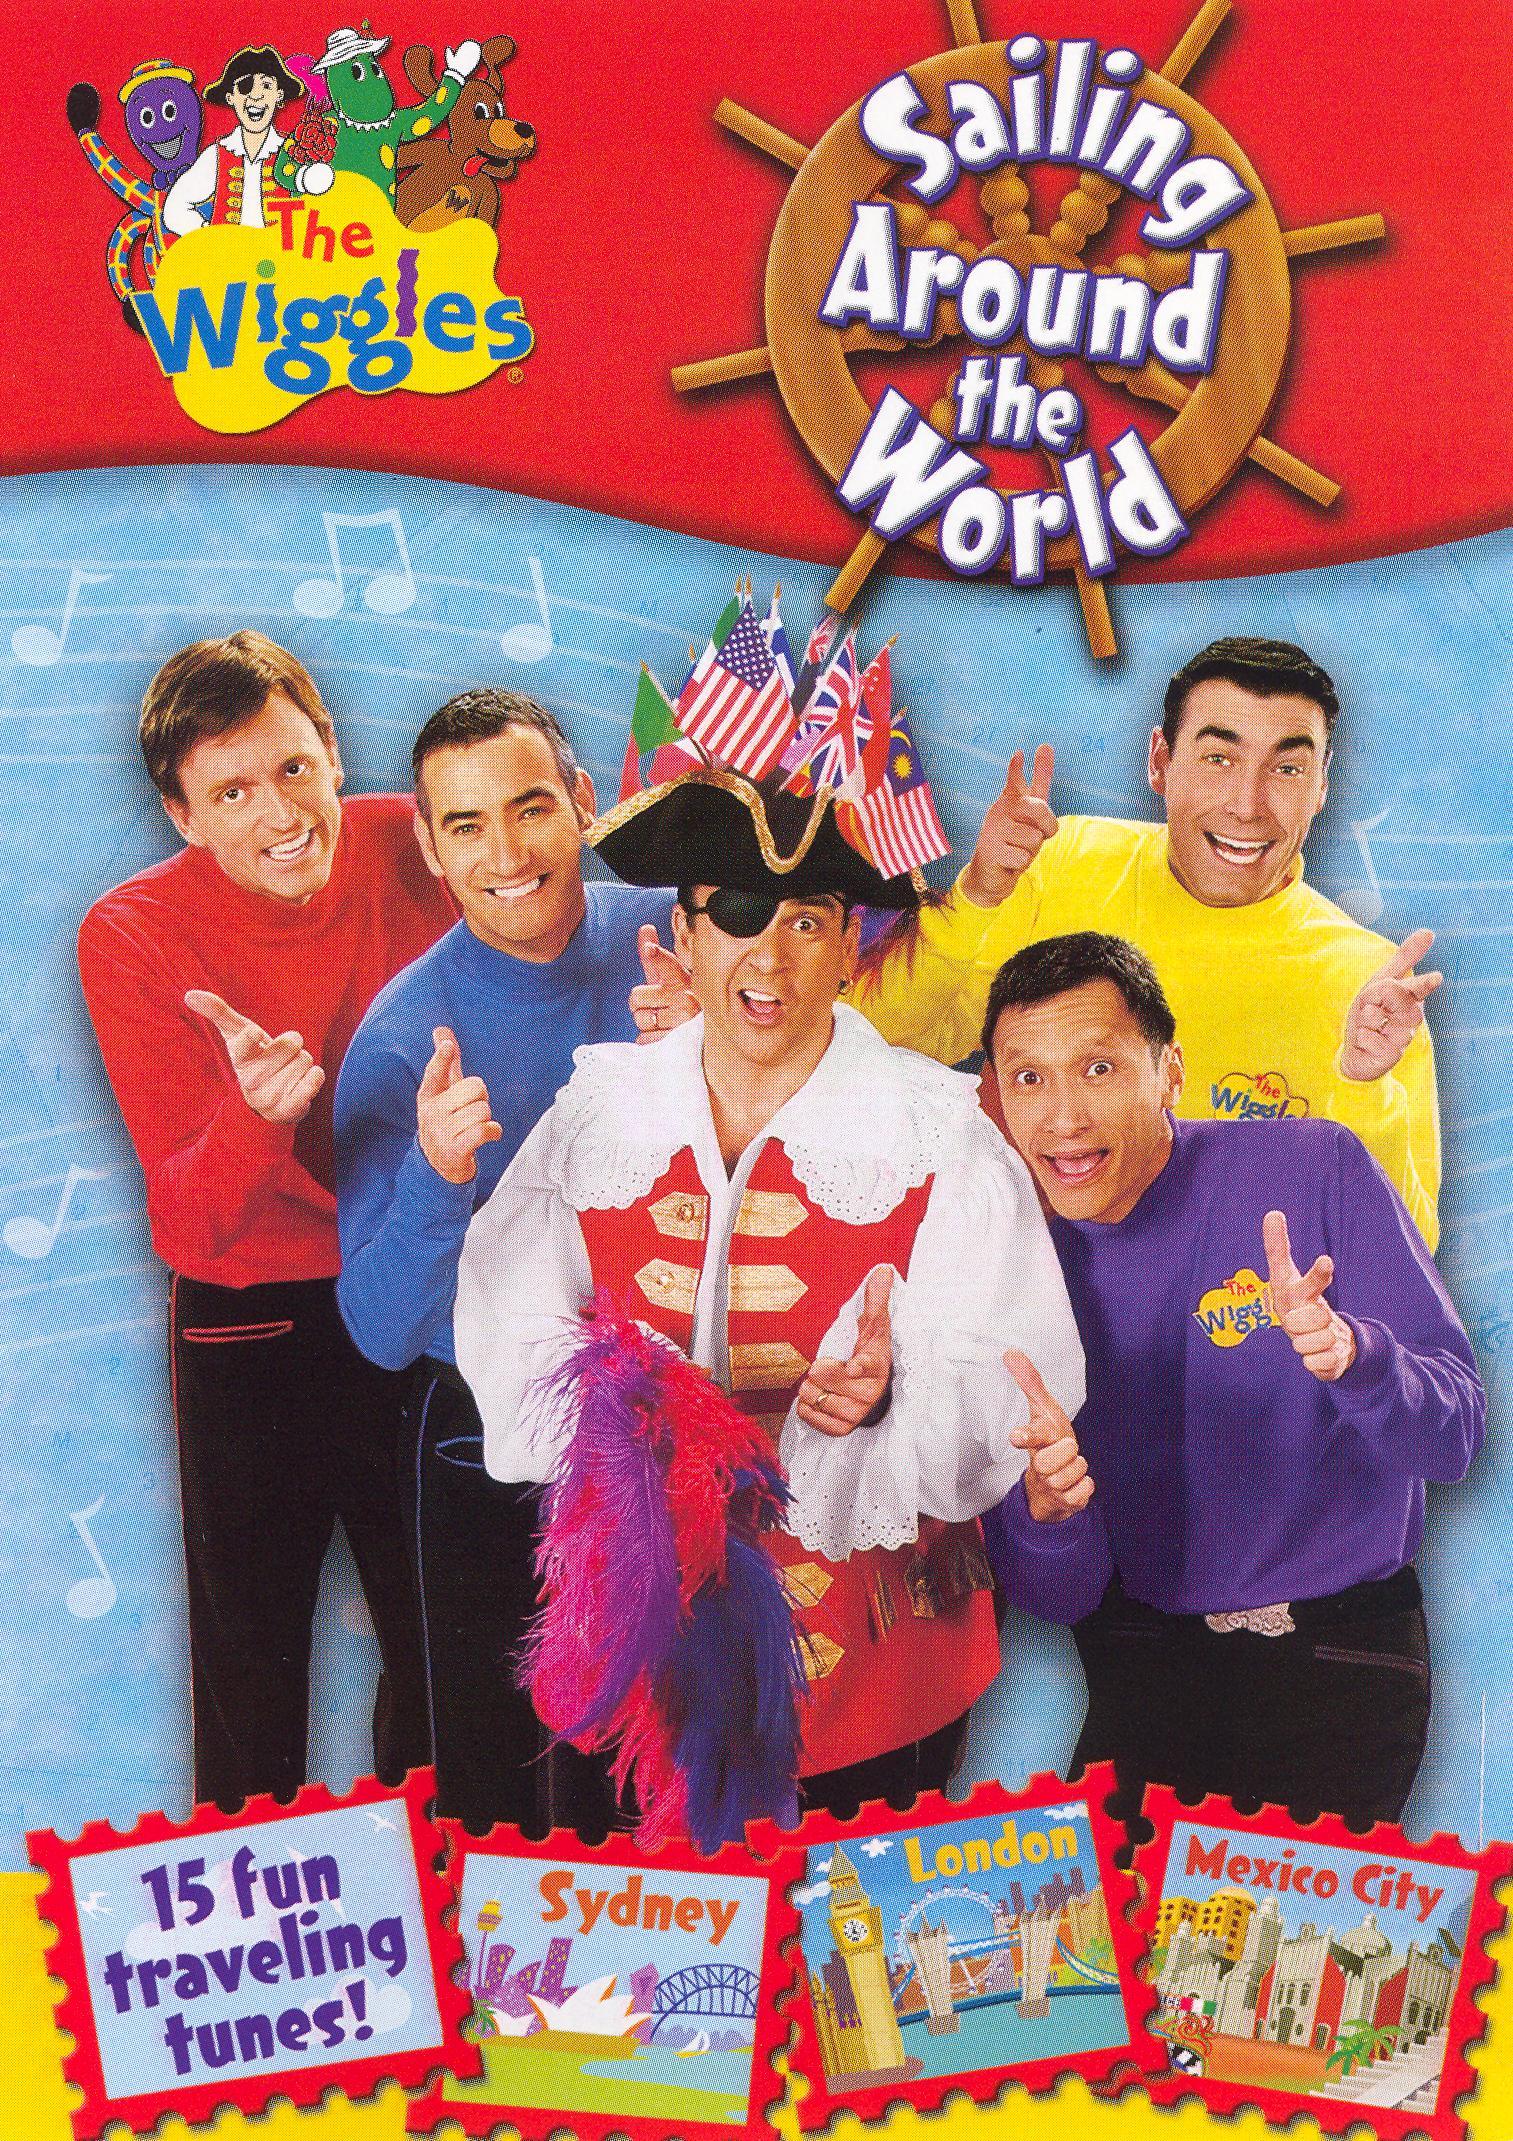 The Wiggles: Sailing Around the World